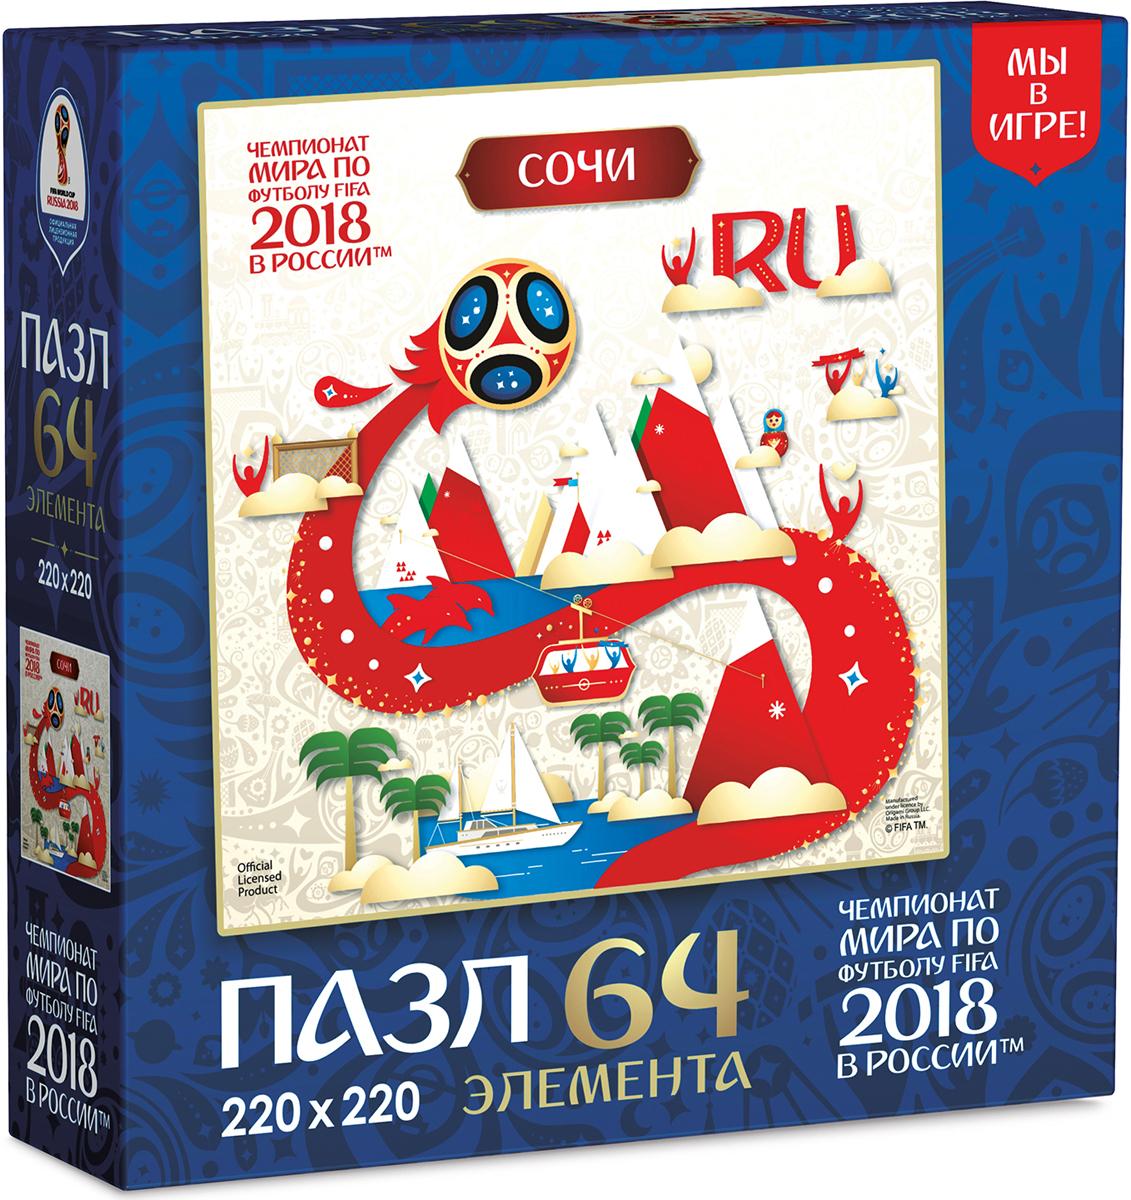 FIFA World Cup Russia 2018 Пазл Look Сочи 03875 цена и фото